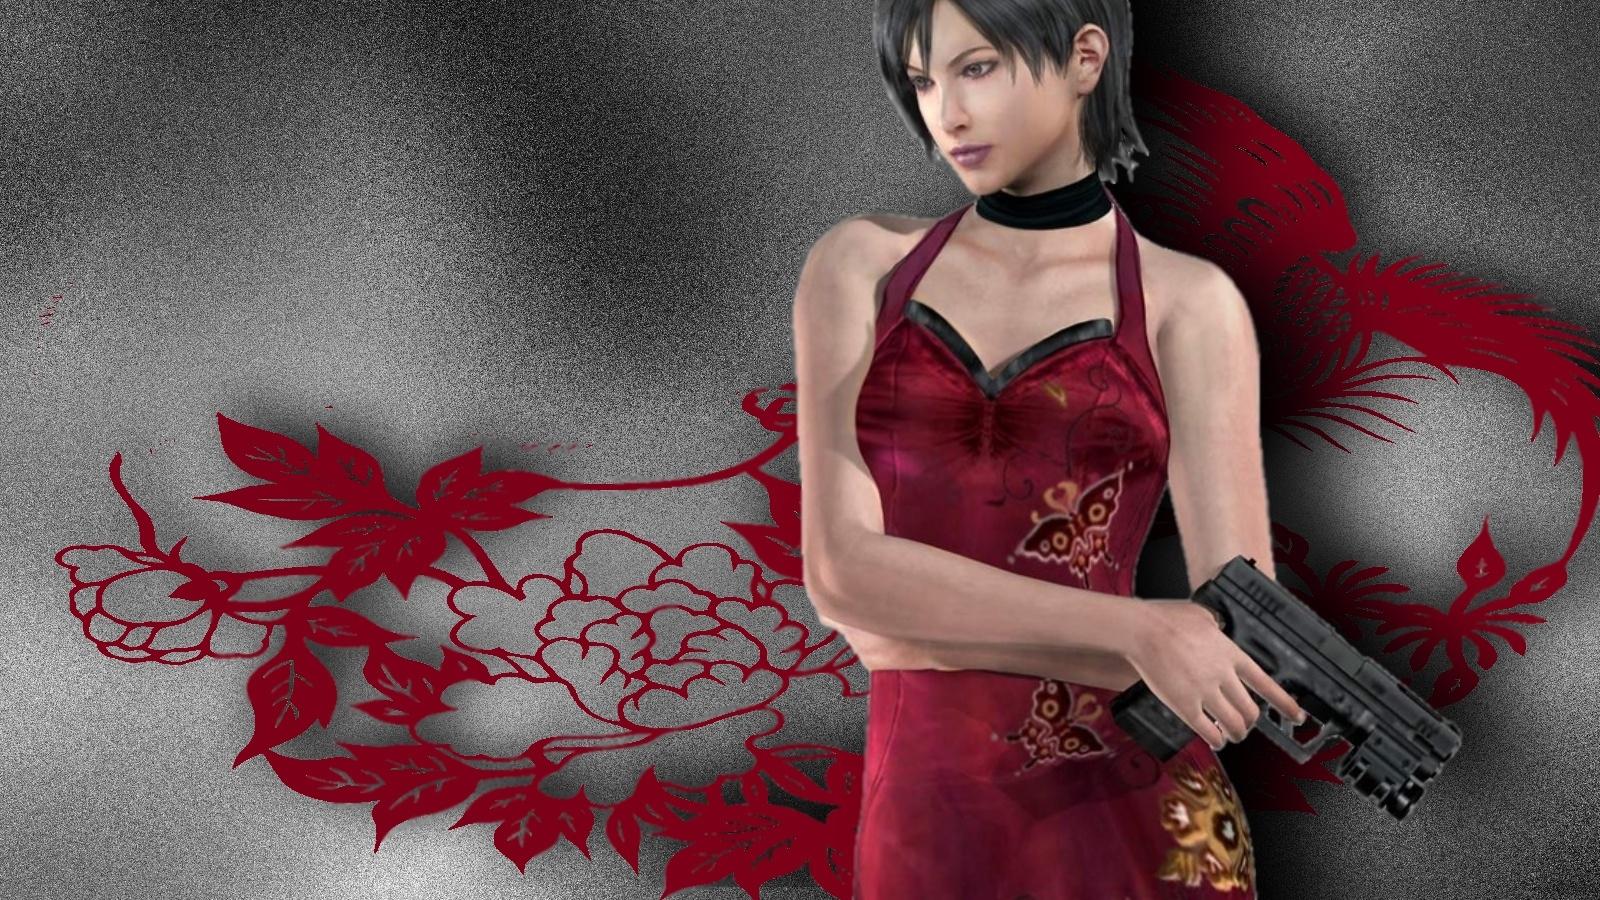 http://1.bp.blogspot.com/-T-hoSBLArNo/UMeX5RhO5iI/AAAAAAAATvc/SPmsFjiEl5M/s1600/Ada_Wong_Resident_Evil_Wallpaper.jpg